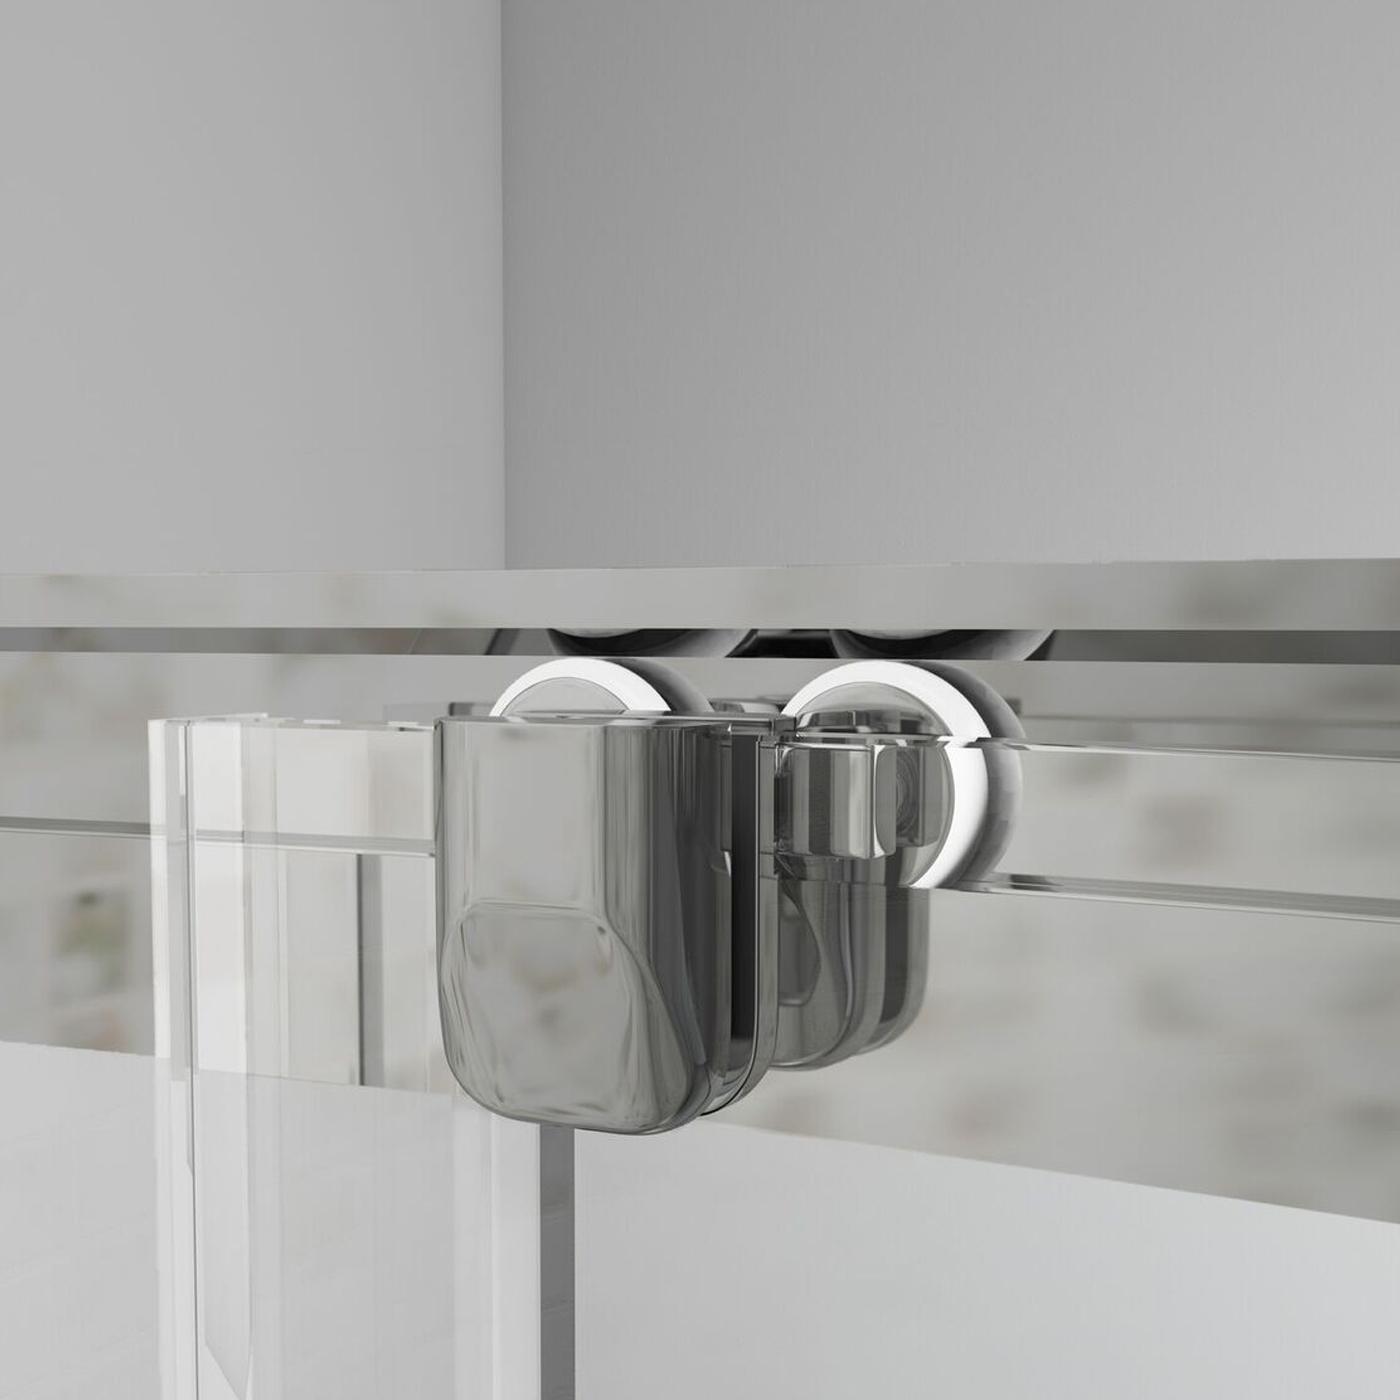 Cali Seis Offset Quadrant Shower Enclosure - 900mm x 760mm - 6mm Glass